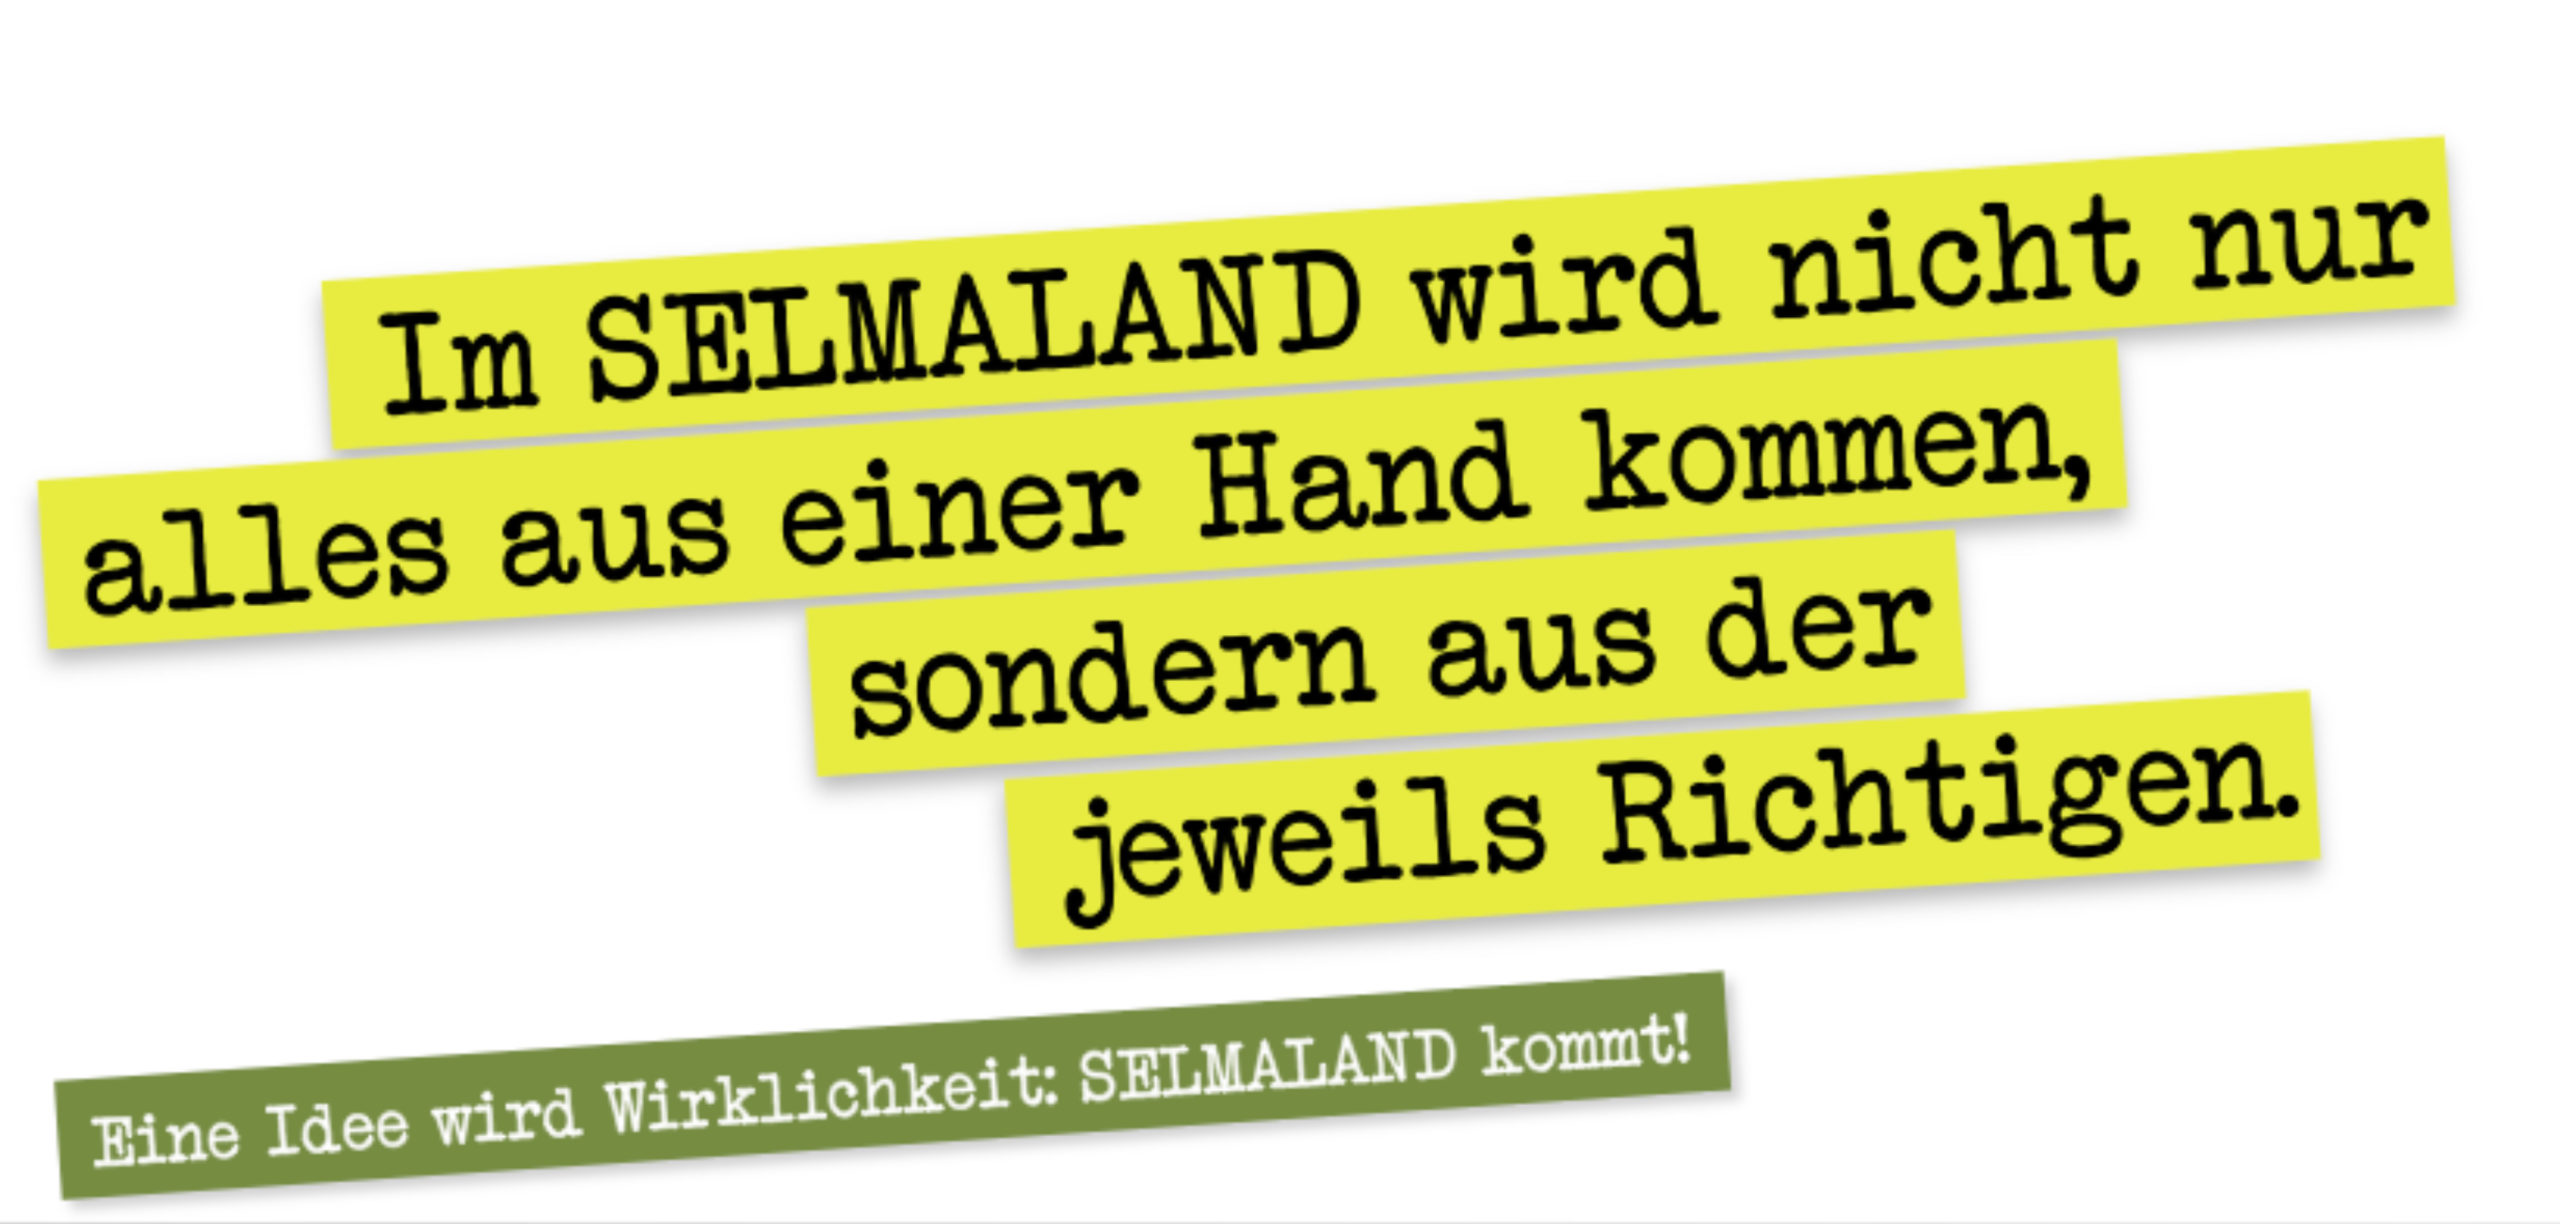 Selmaland